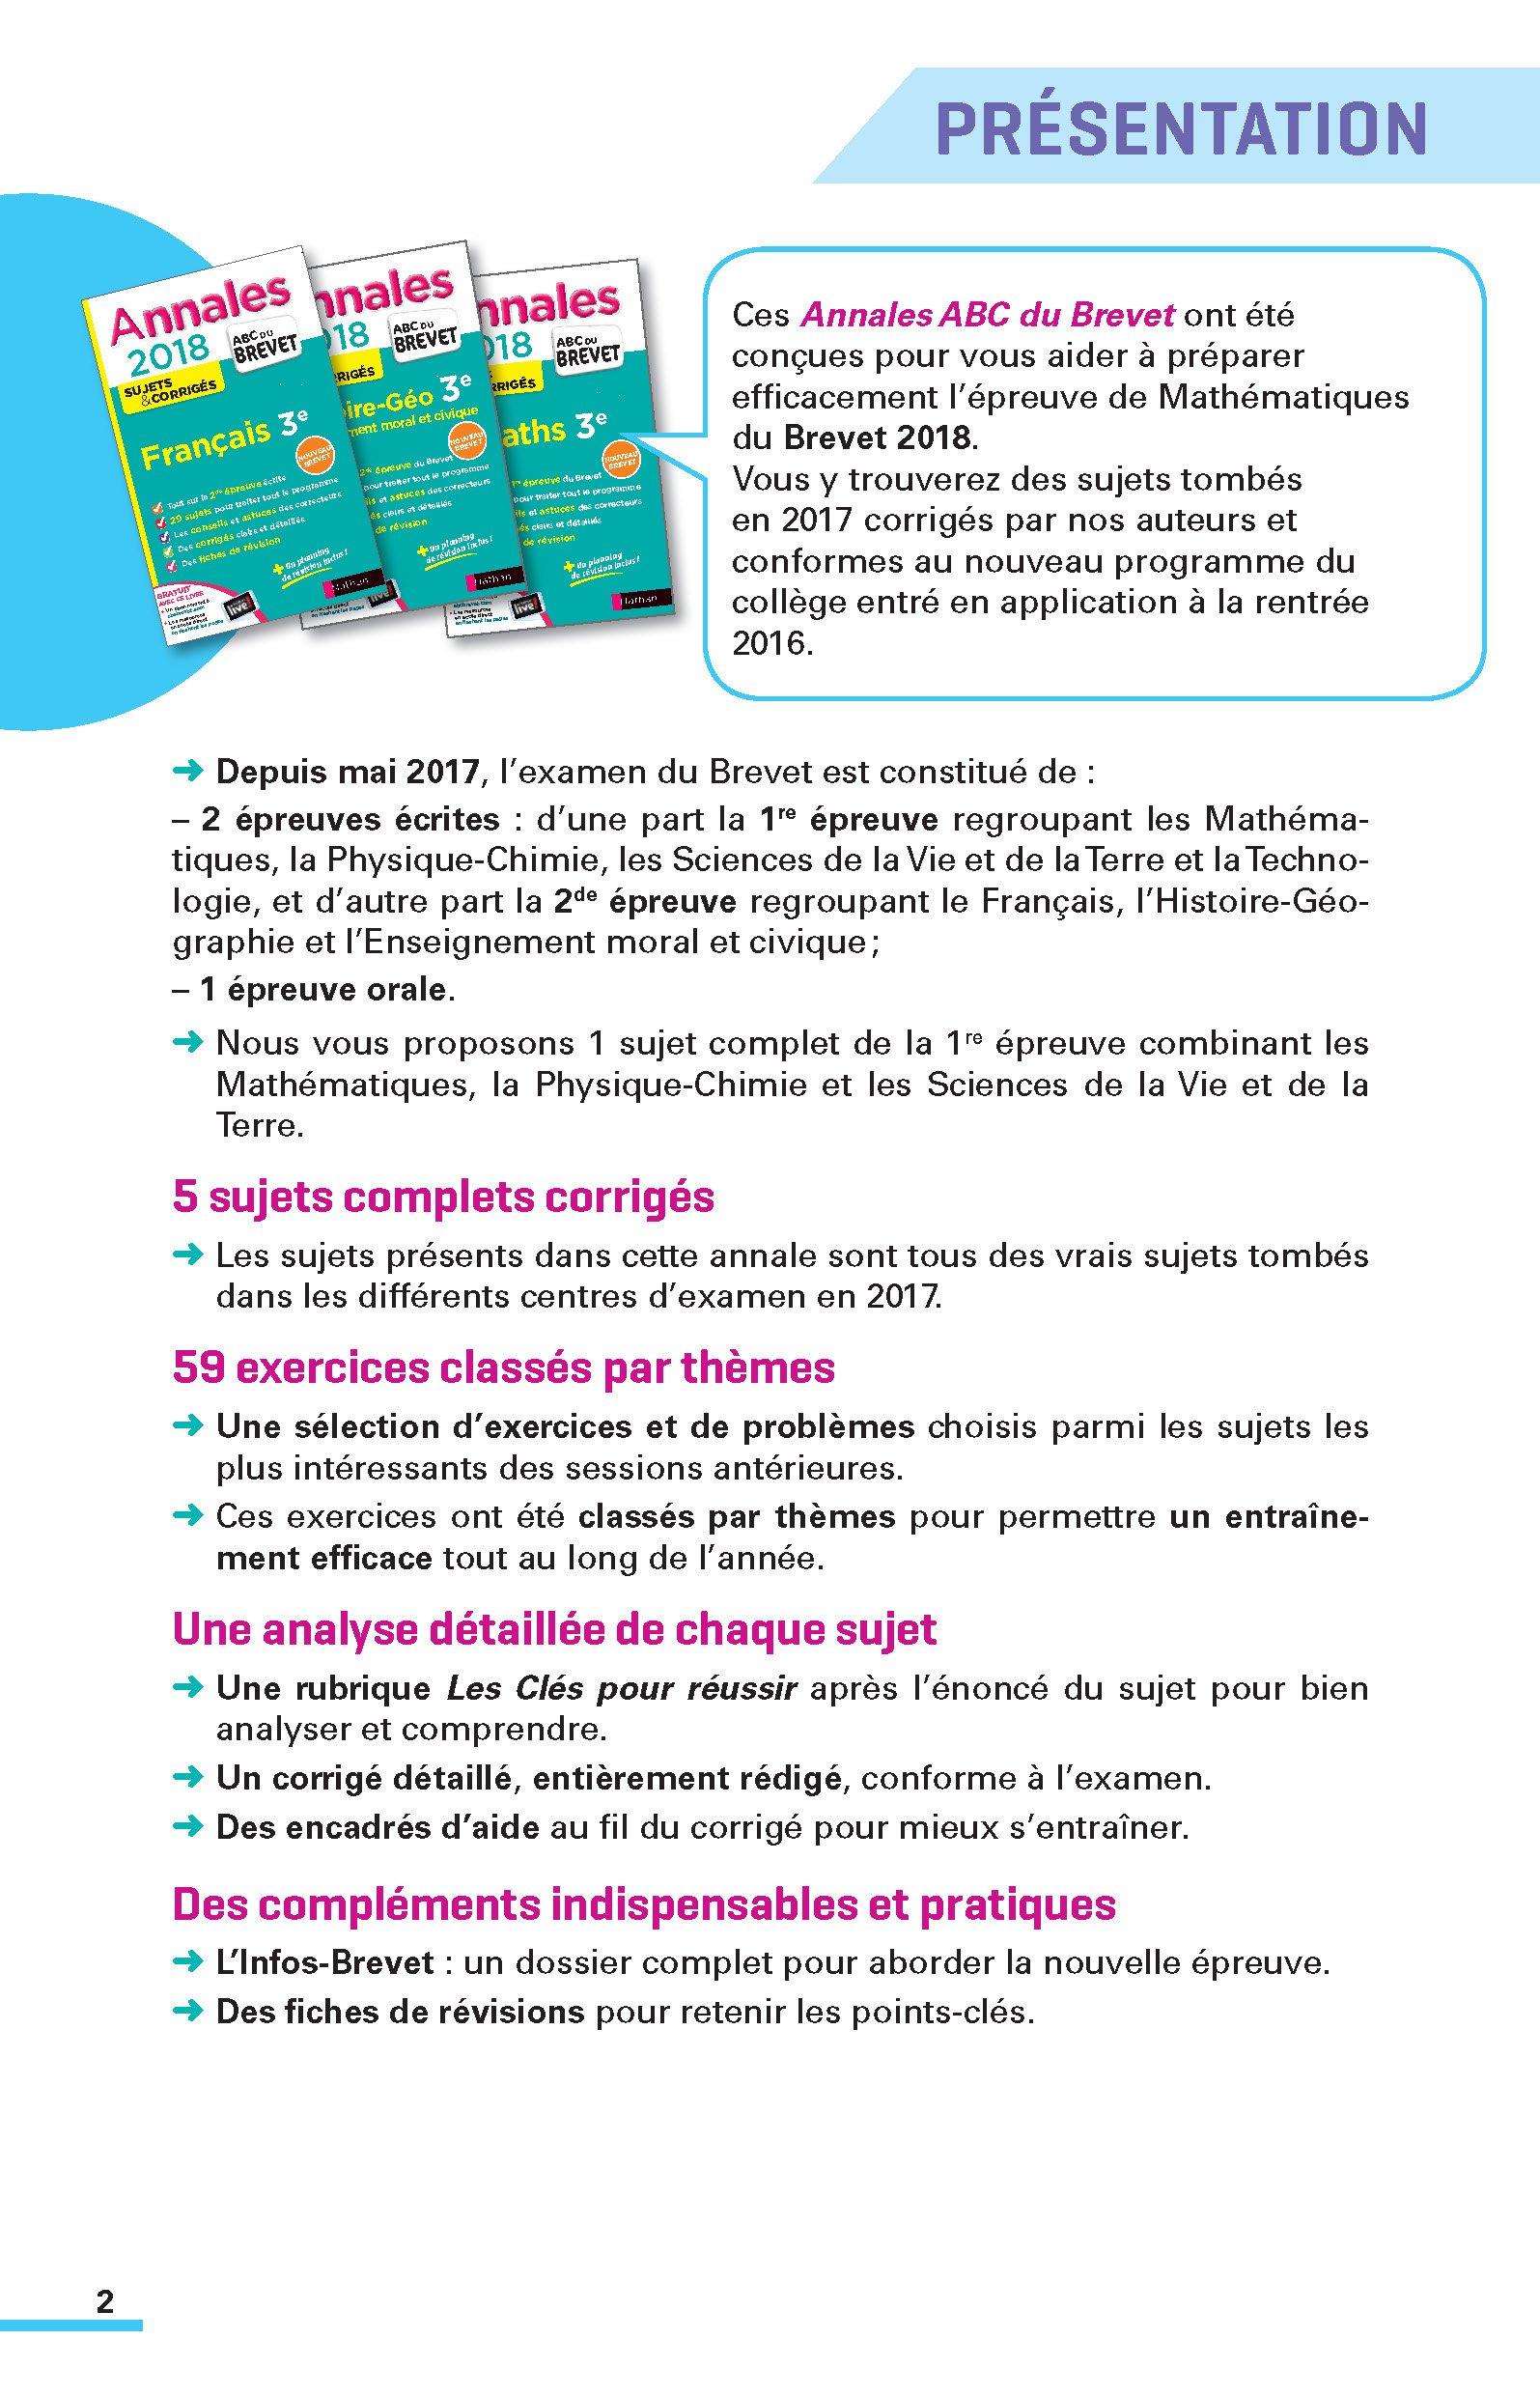 Annales Brevet - Maths 3e - Corriges - 2018 Annales ABC du Brevet: Amazon.es: Collectif: Libros en idiomas extranjeros